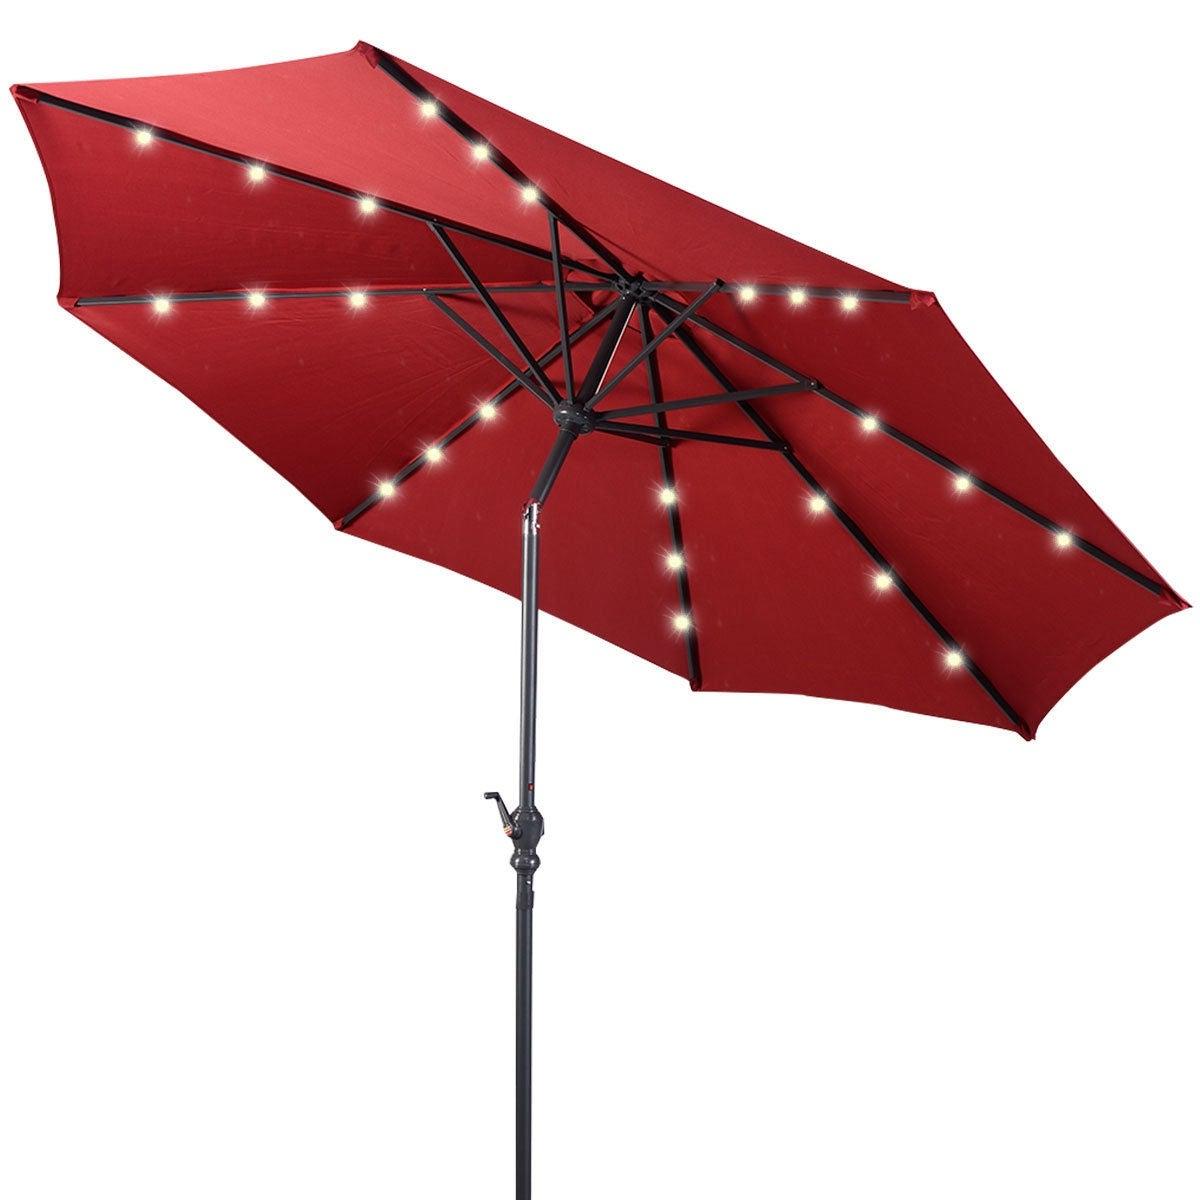 Our Best Patio Umbrellas For Venice Lighted Umbrellas (View 7 of 20)